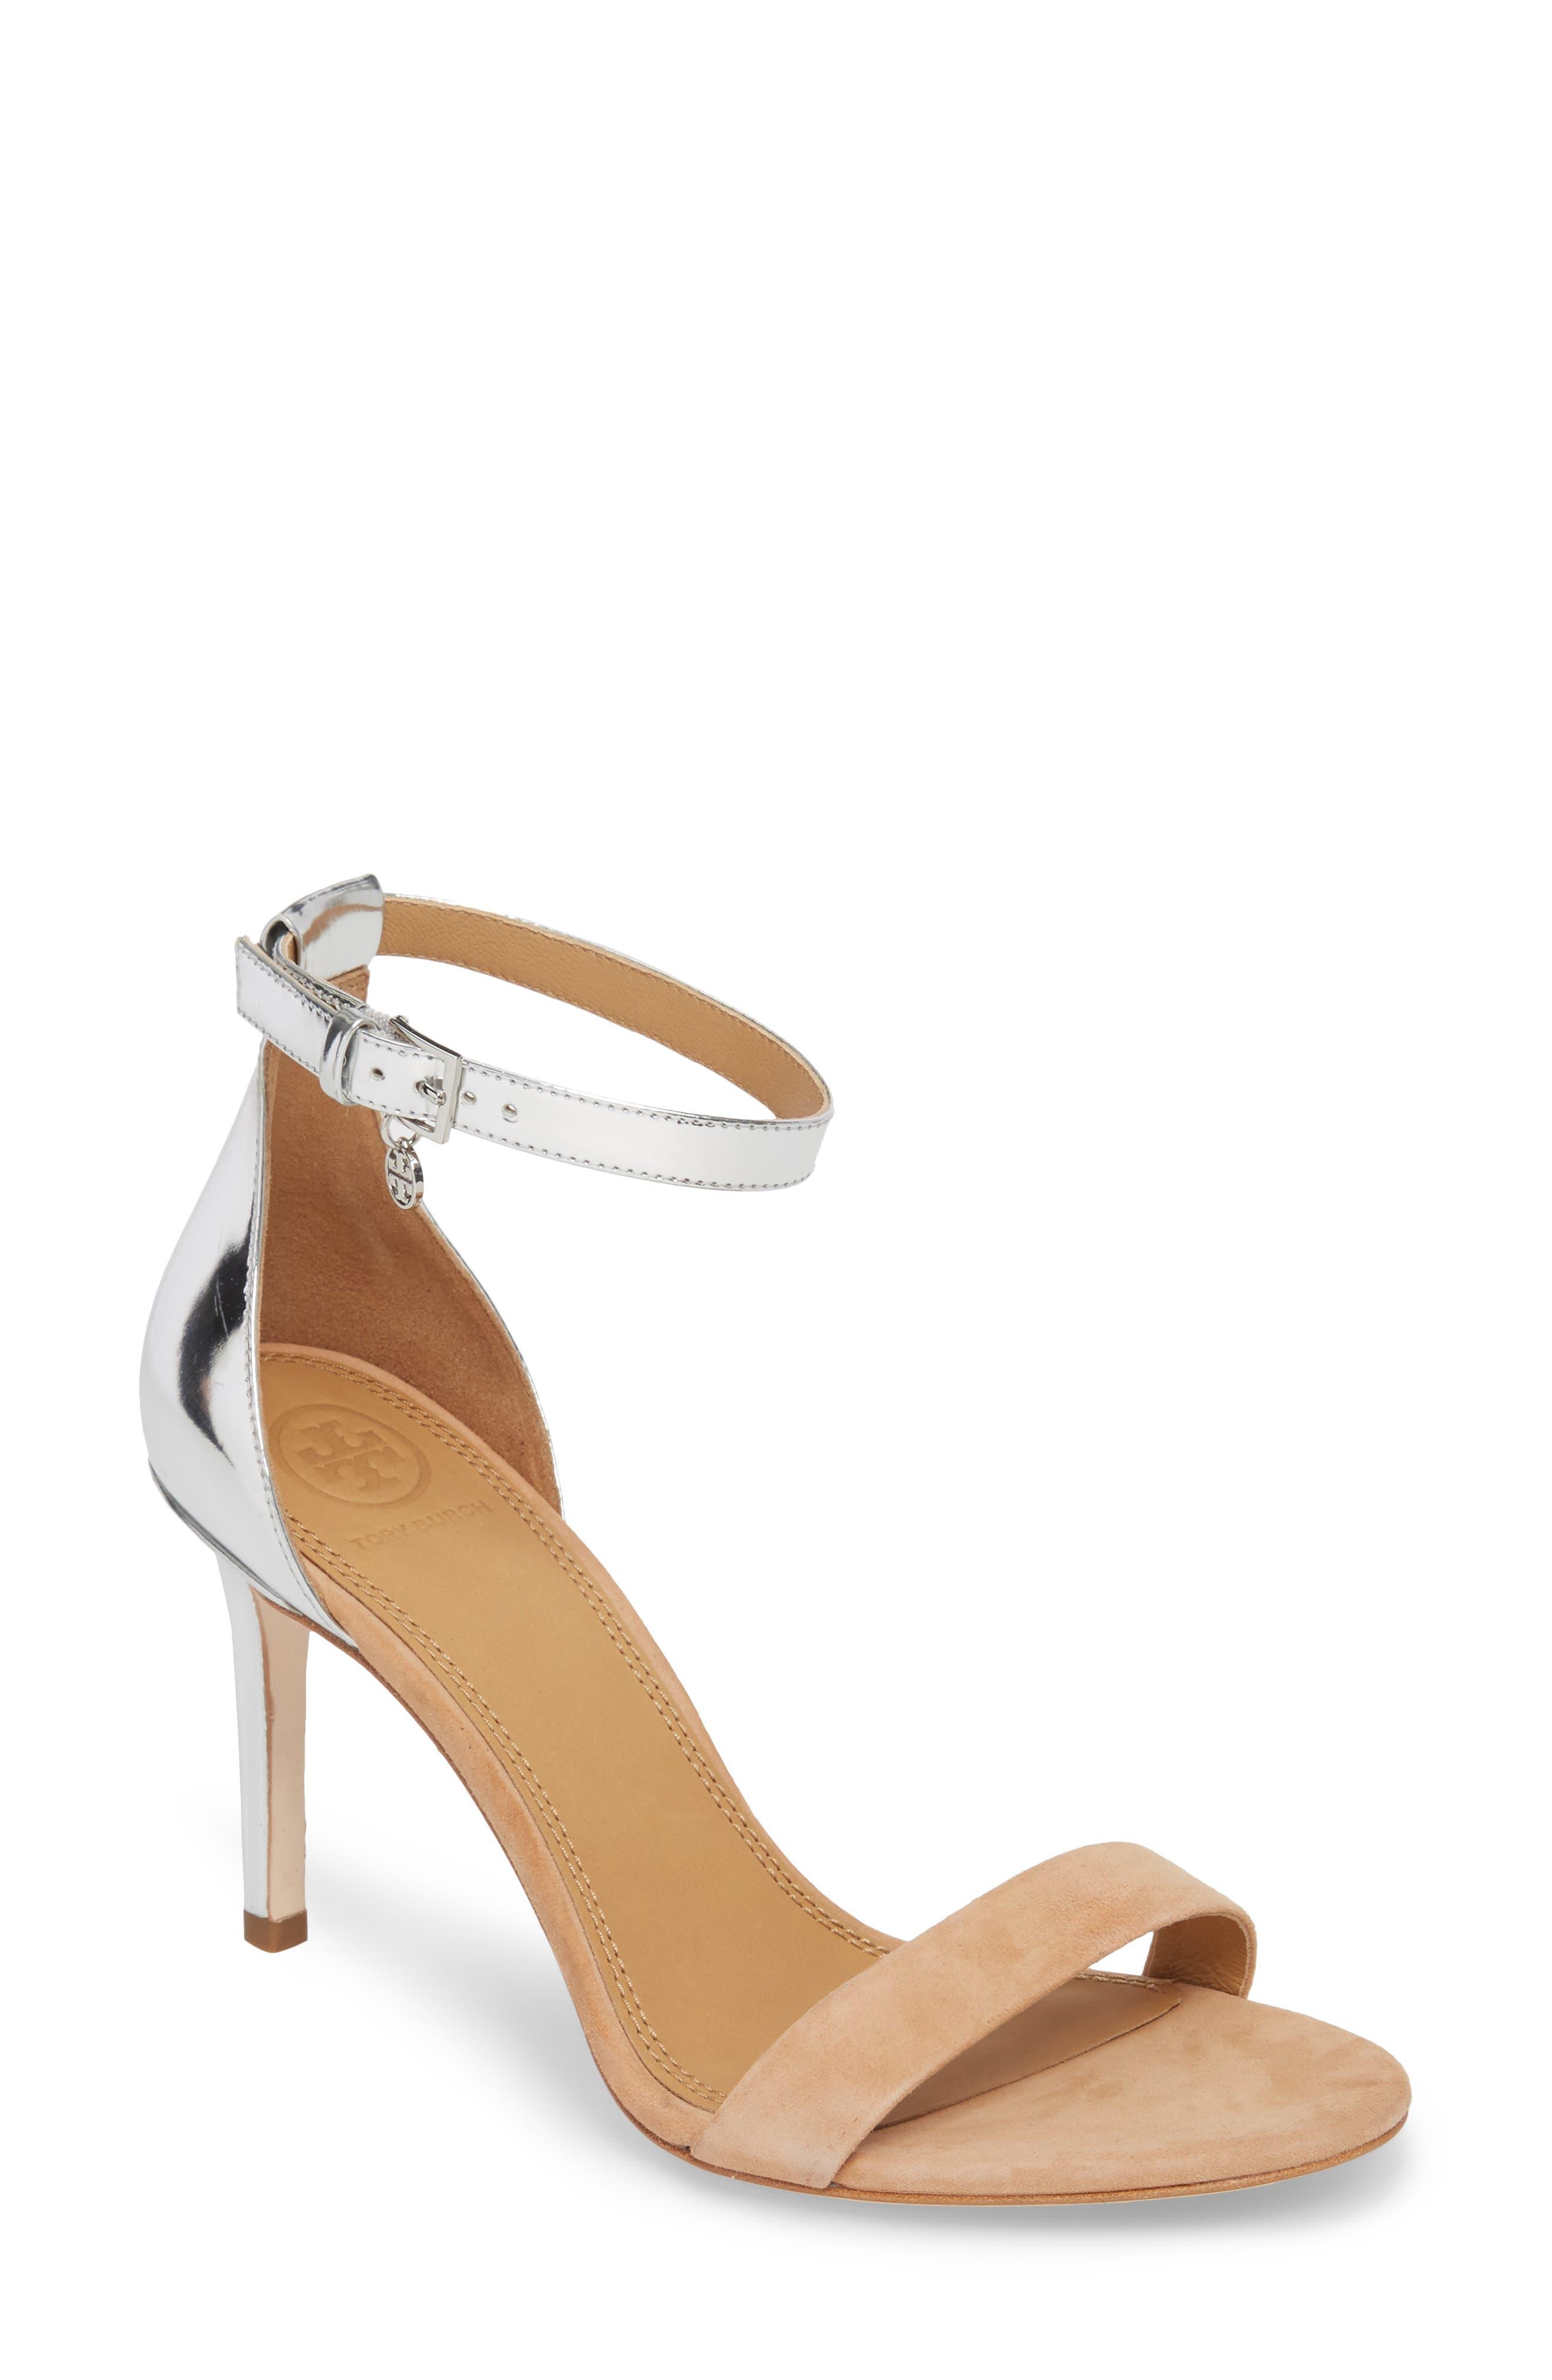 Ellie Ankle Strap Sandal,                         Main,                         color, 020